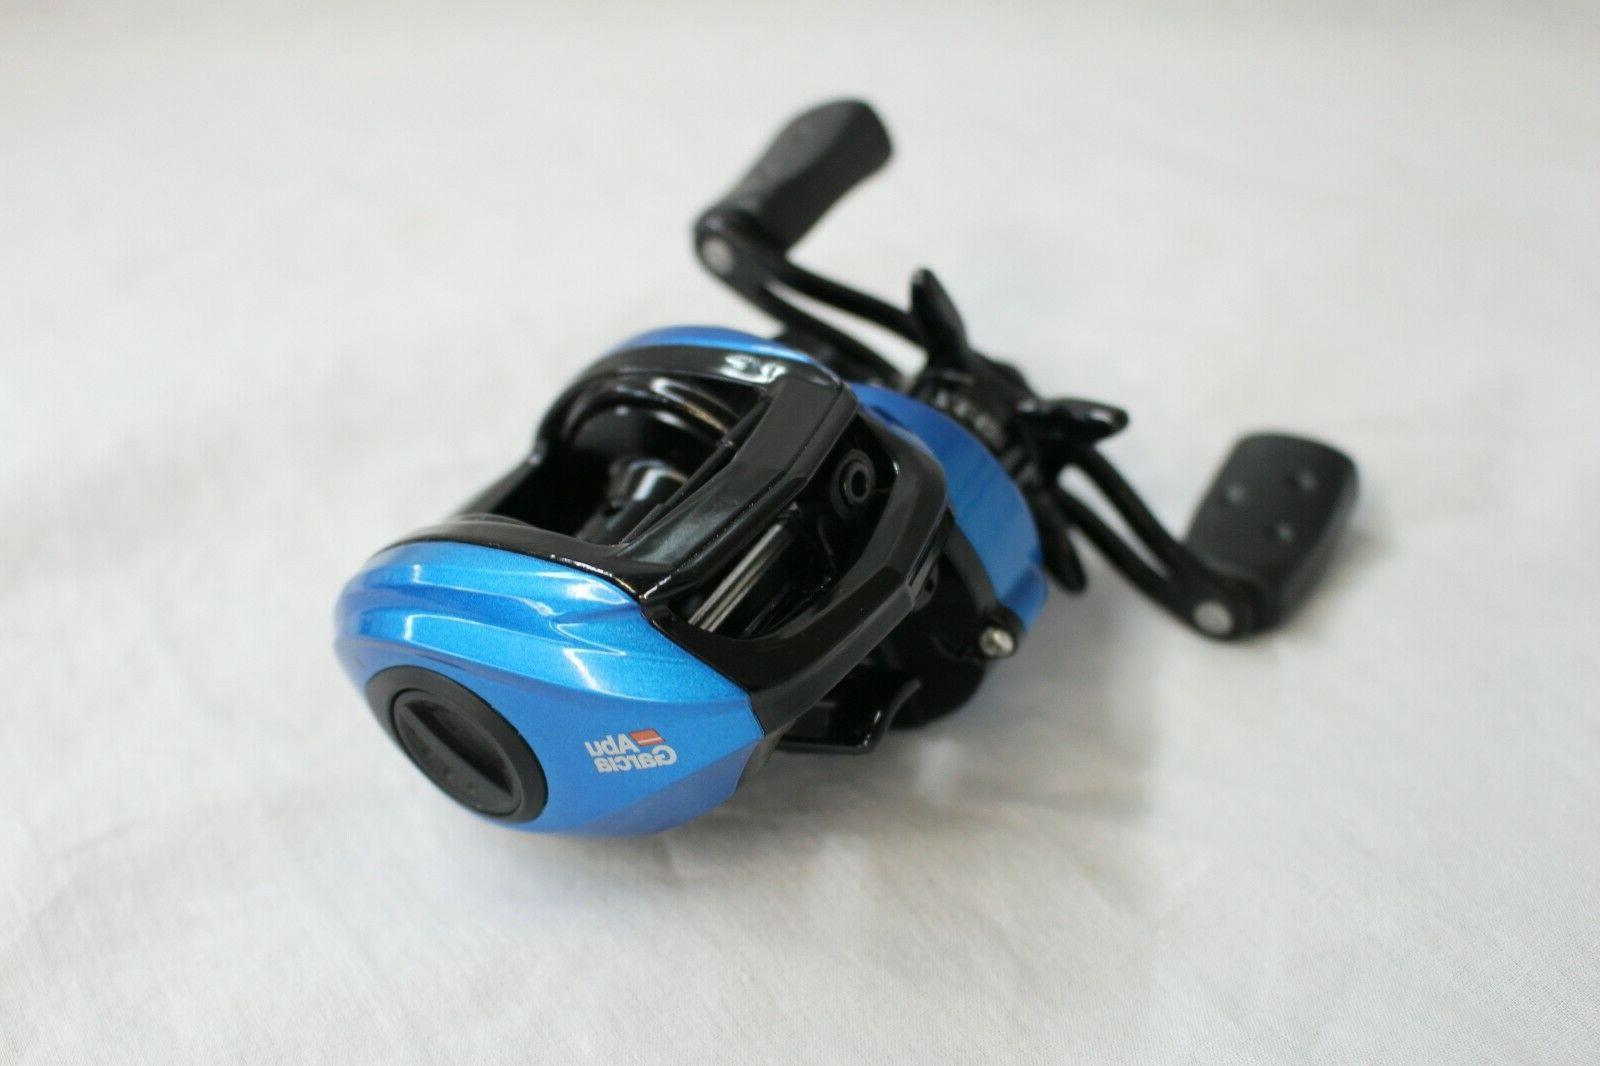 ABU GARCIA BLUE MAX LOW RIGHT-HANDED BAITCASTING